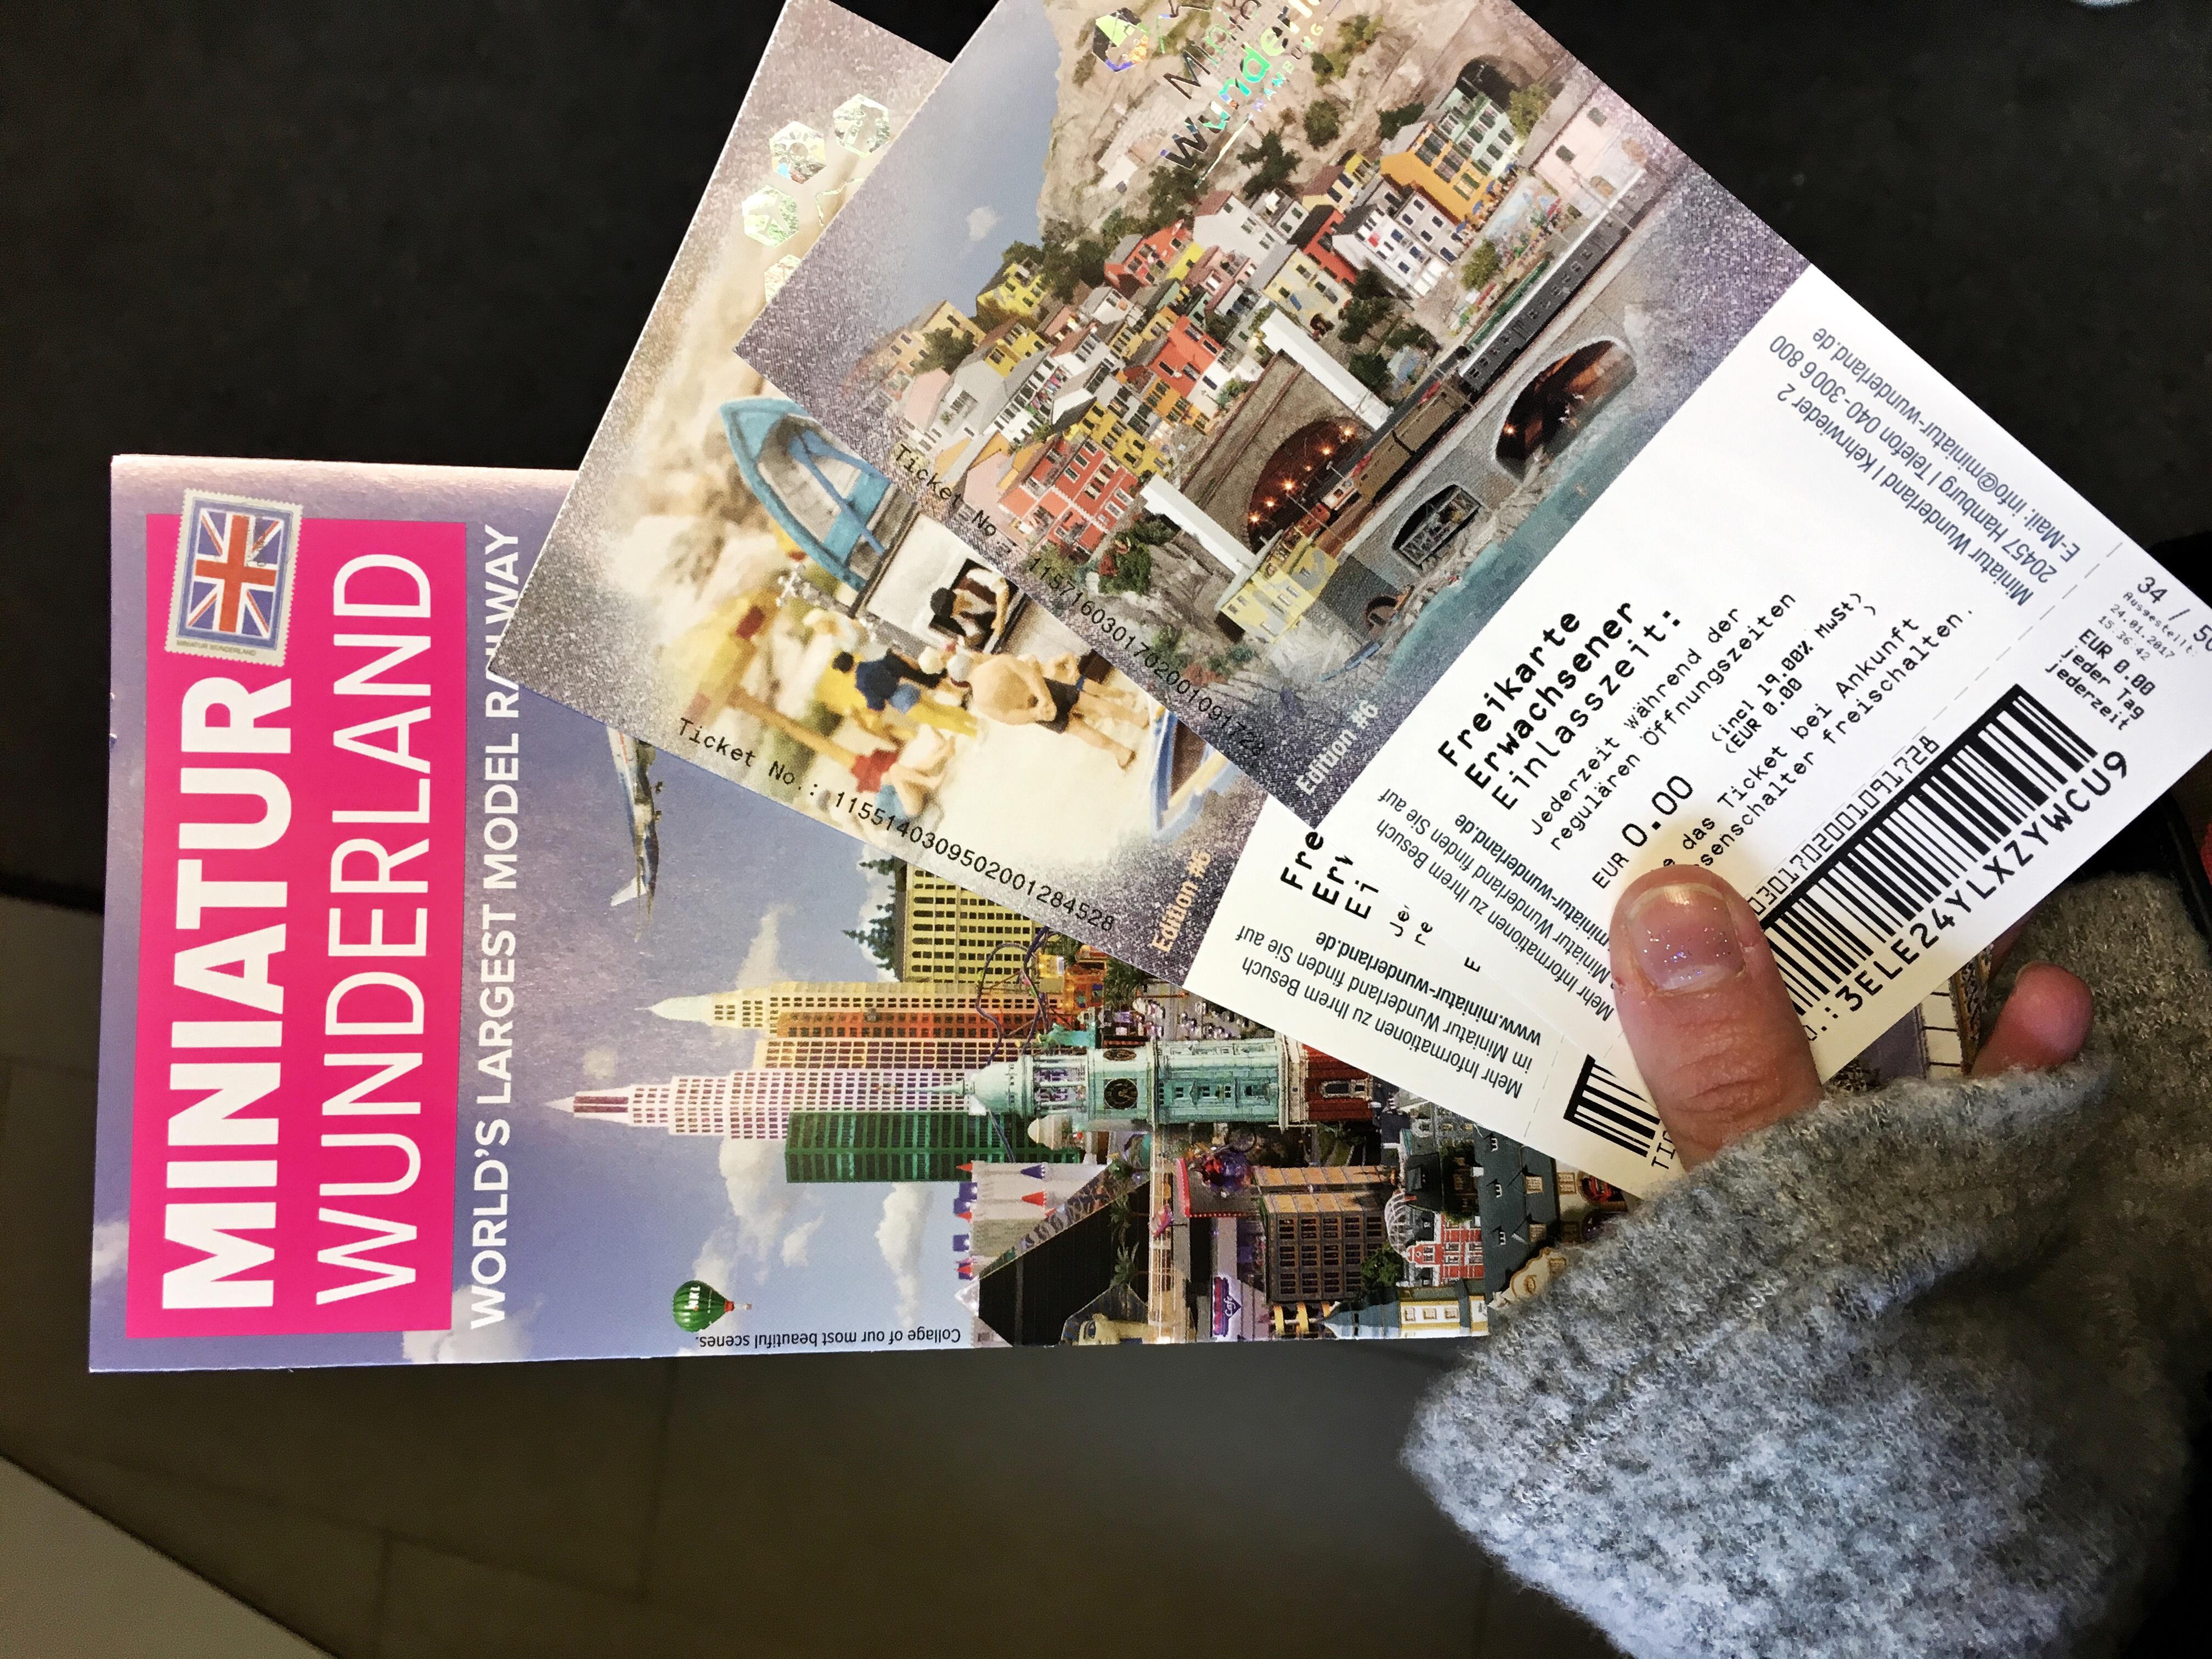 Miniature Wunderland i biglietti